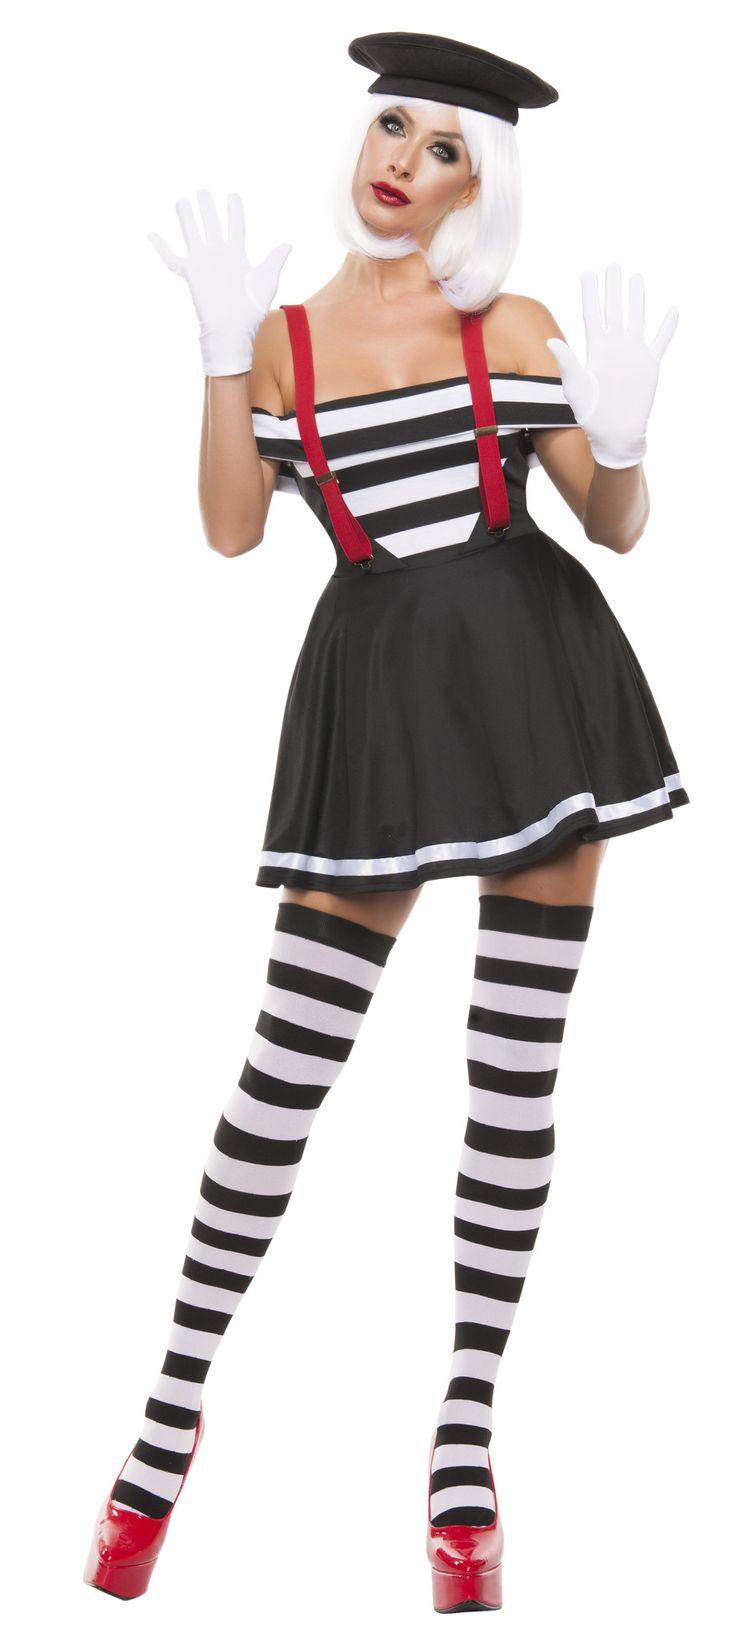 girl halloween costume ideas yahoo answers